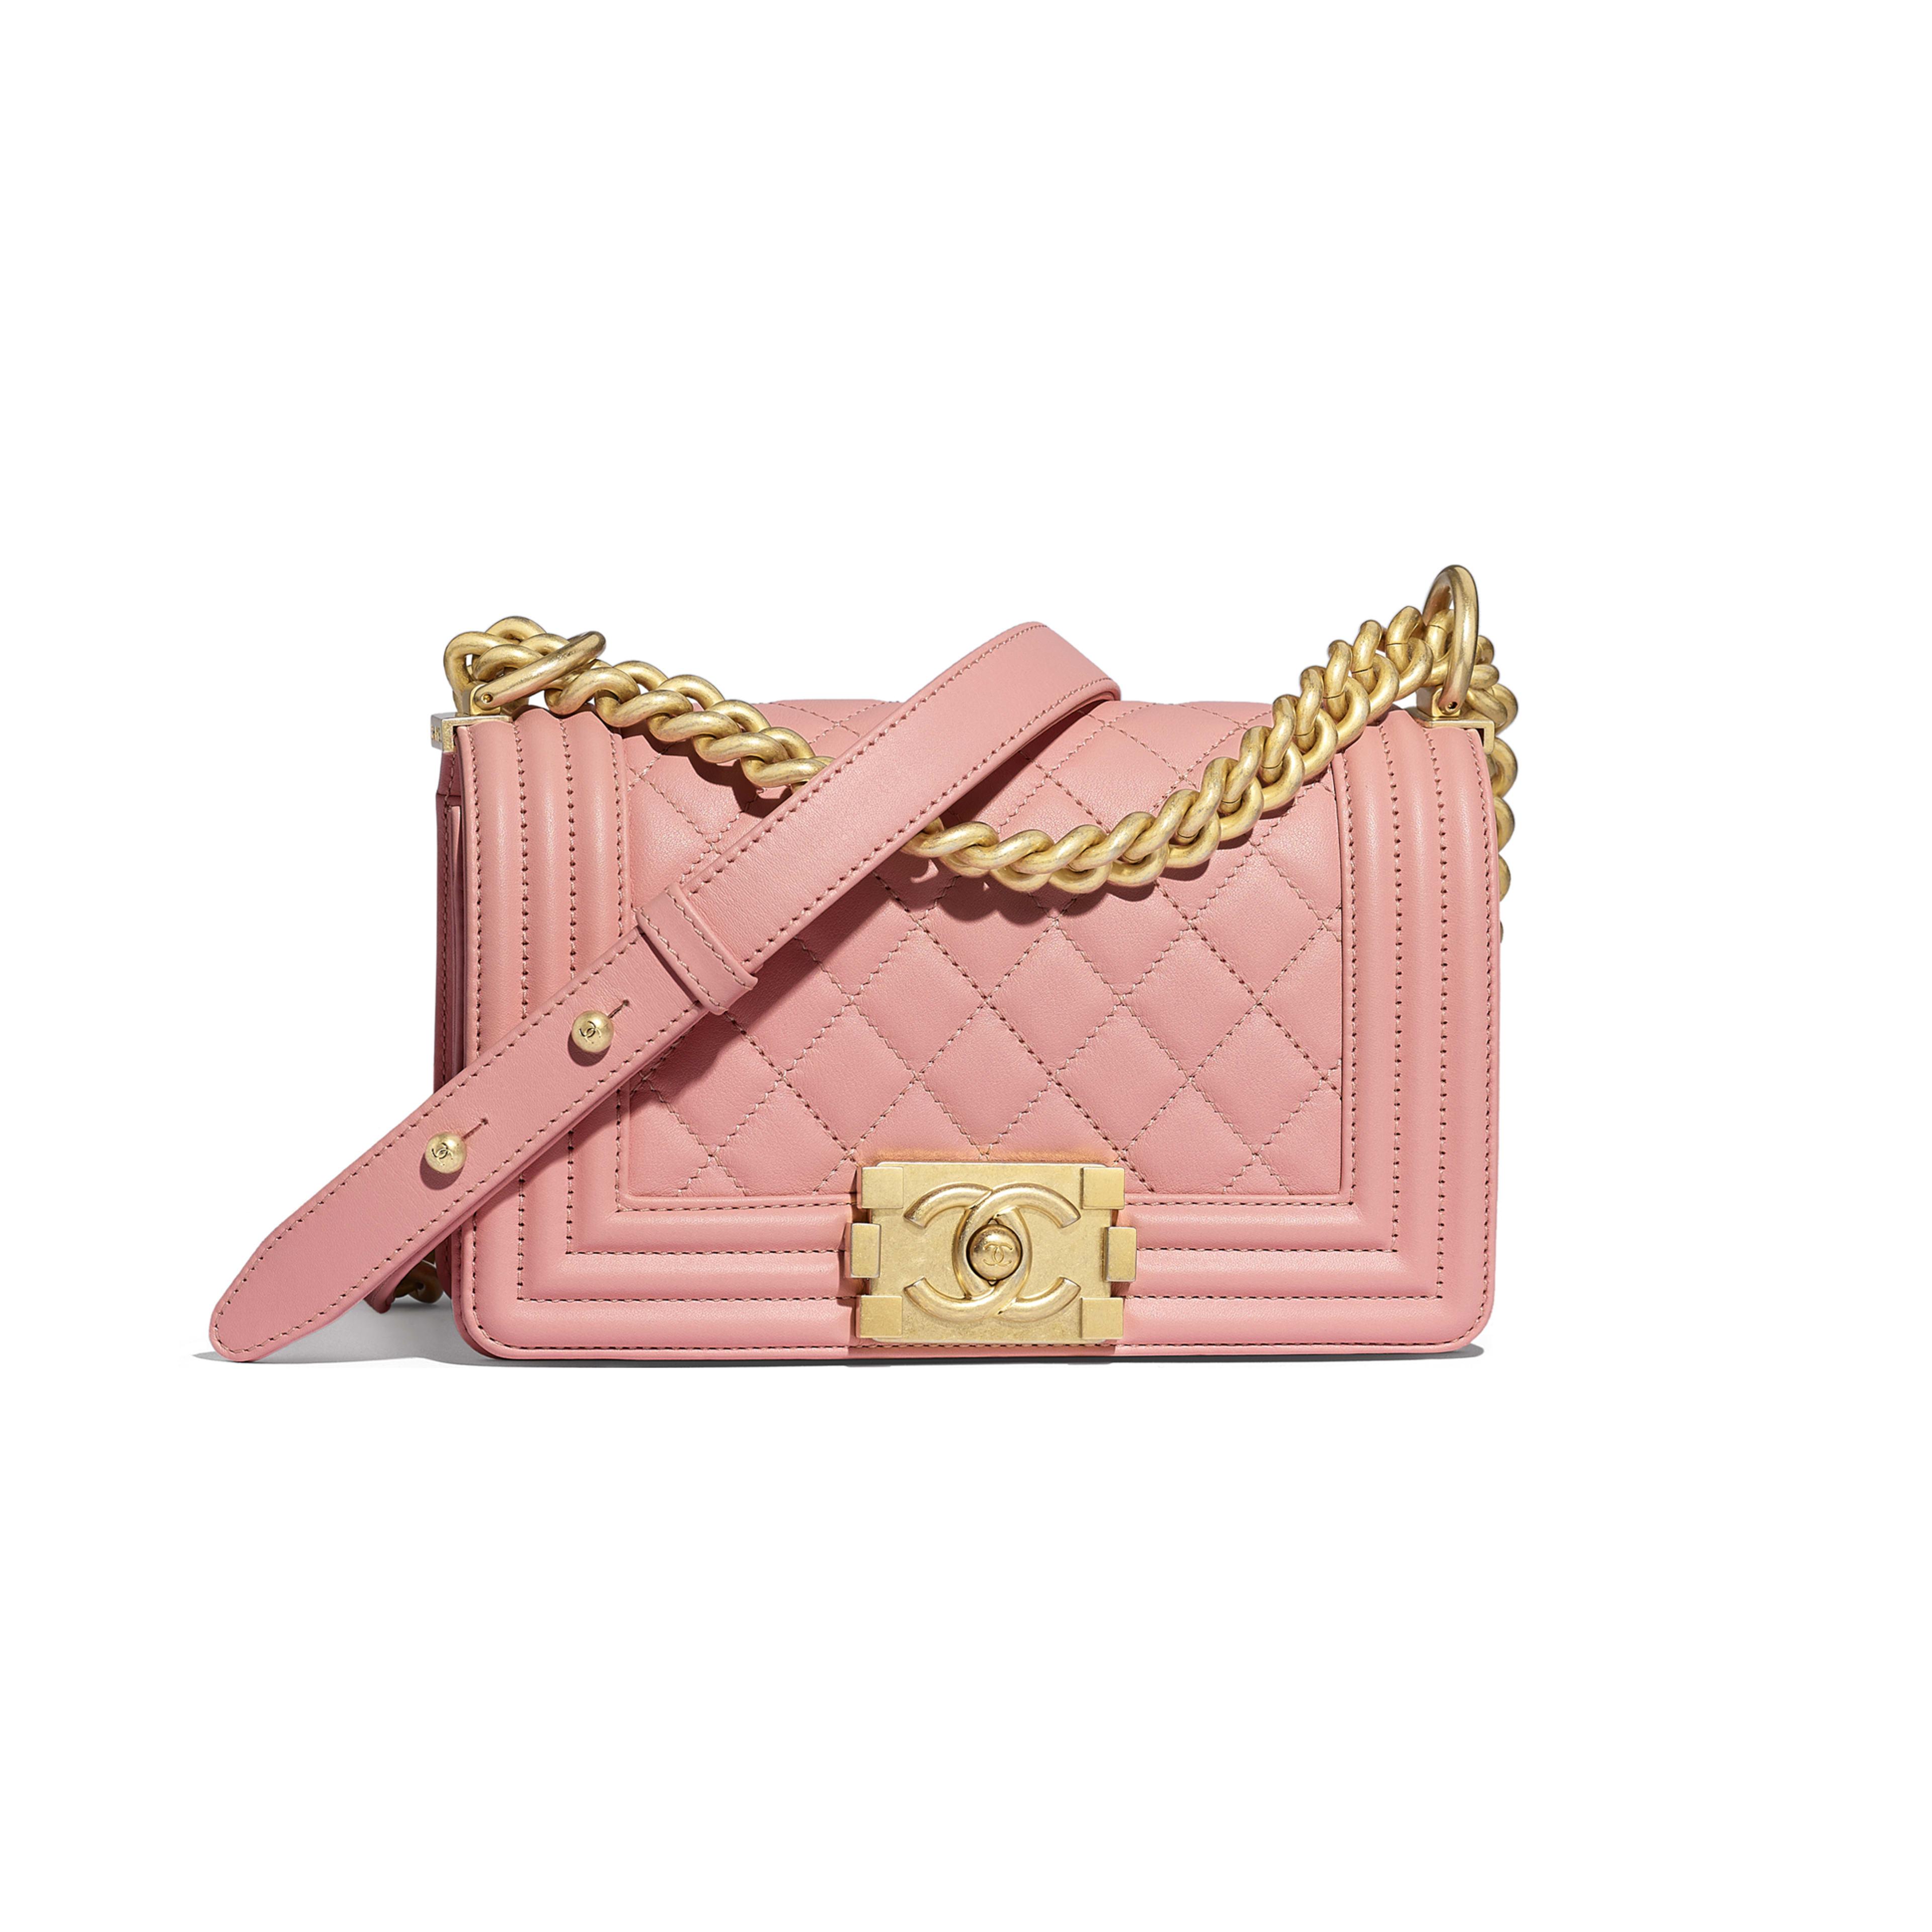 Small BOY CHANEL Handbag - Pink - Calfskin & Gold-Tone Metal - Default view - see full sized version